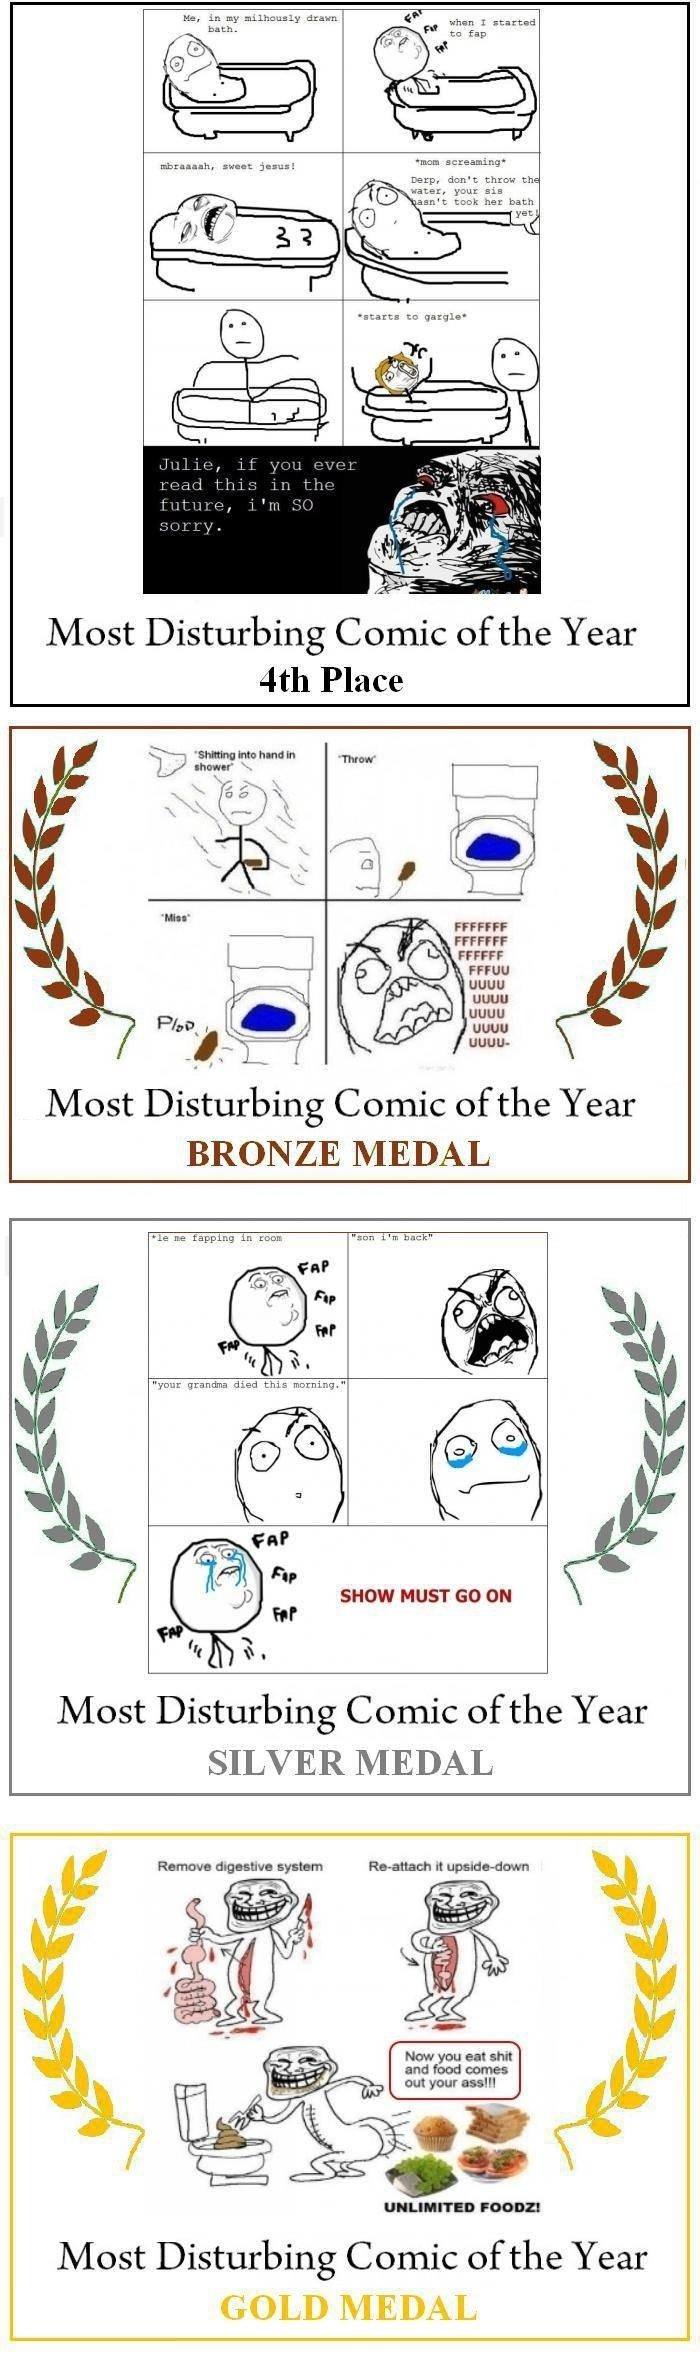 Disturbing comics. Not OC. 1: paah. Most Disturbing Comic of the Year BRONZE MEDAL Most Disturbing Comic of the Year SILVER MEDAL Most Disturbing Comic of the Y